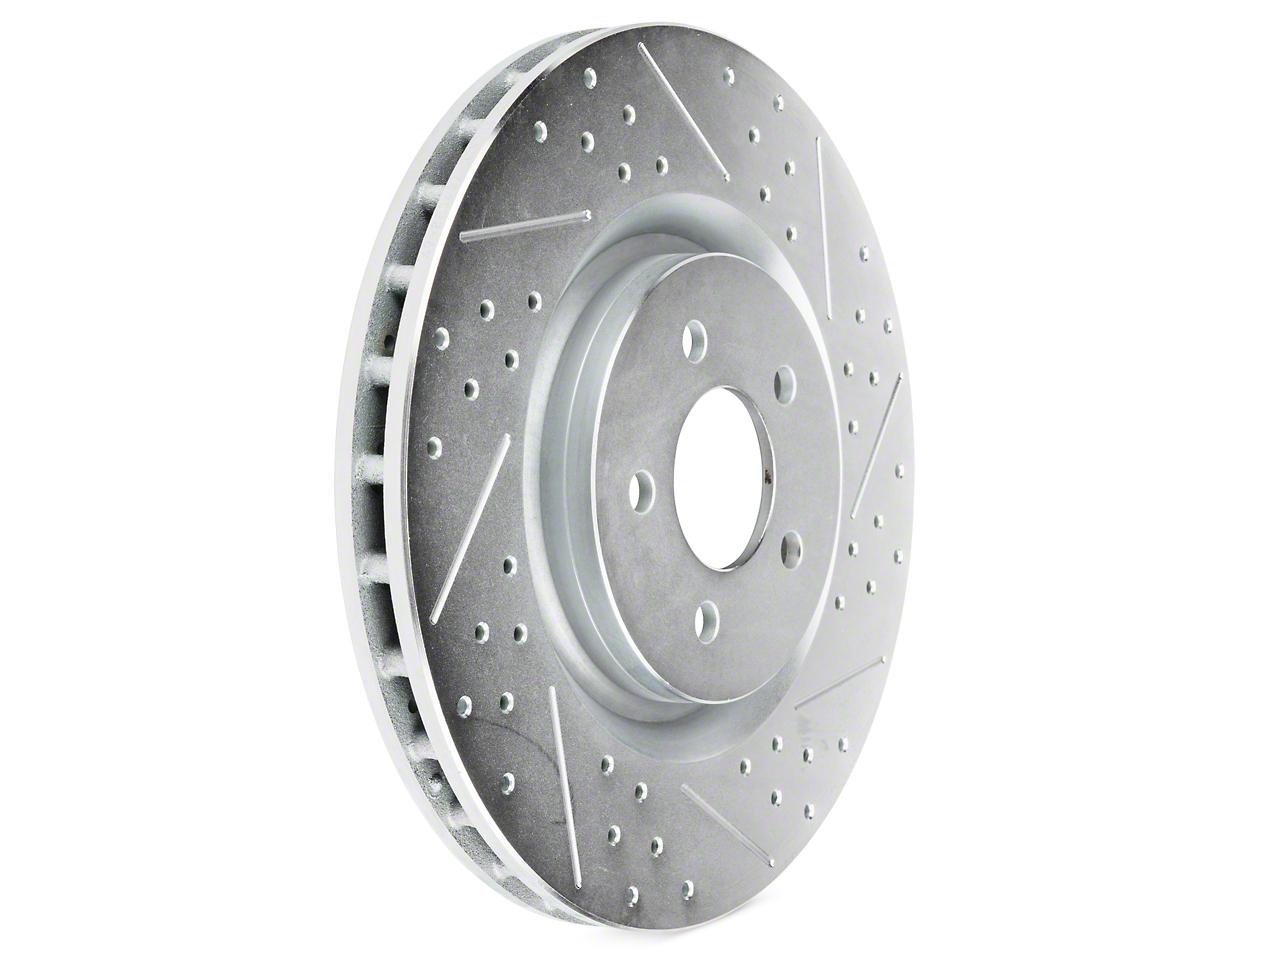 Baer Decela Sport Rotors - Front Pair (11-14 GT Brembo, 12-13 BOSS, 07-12 GT500)